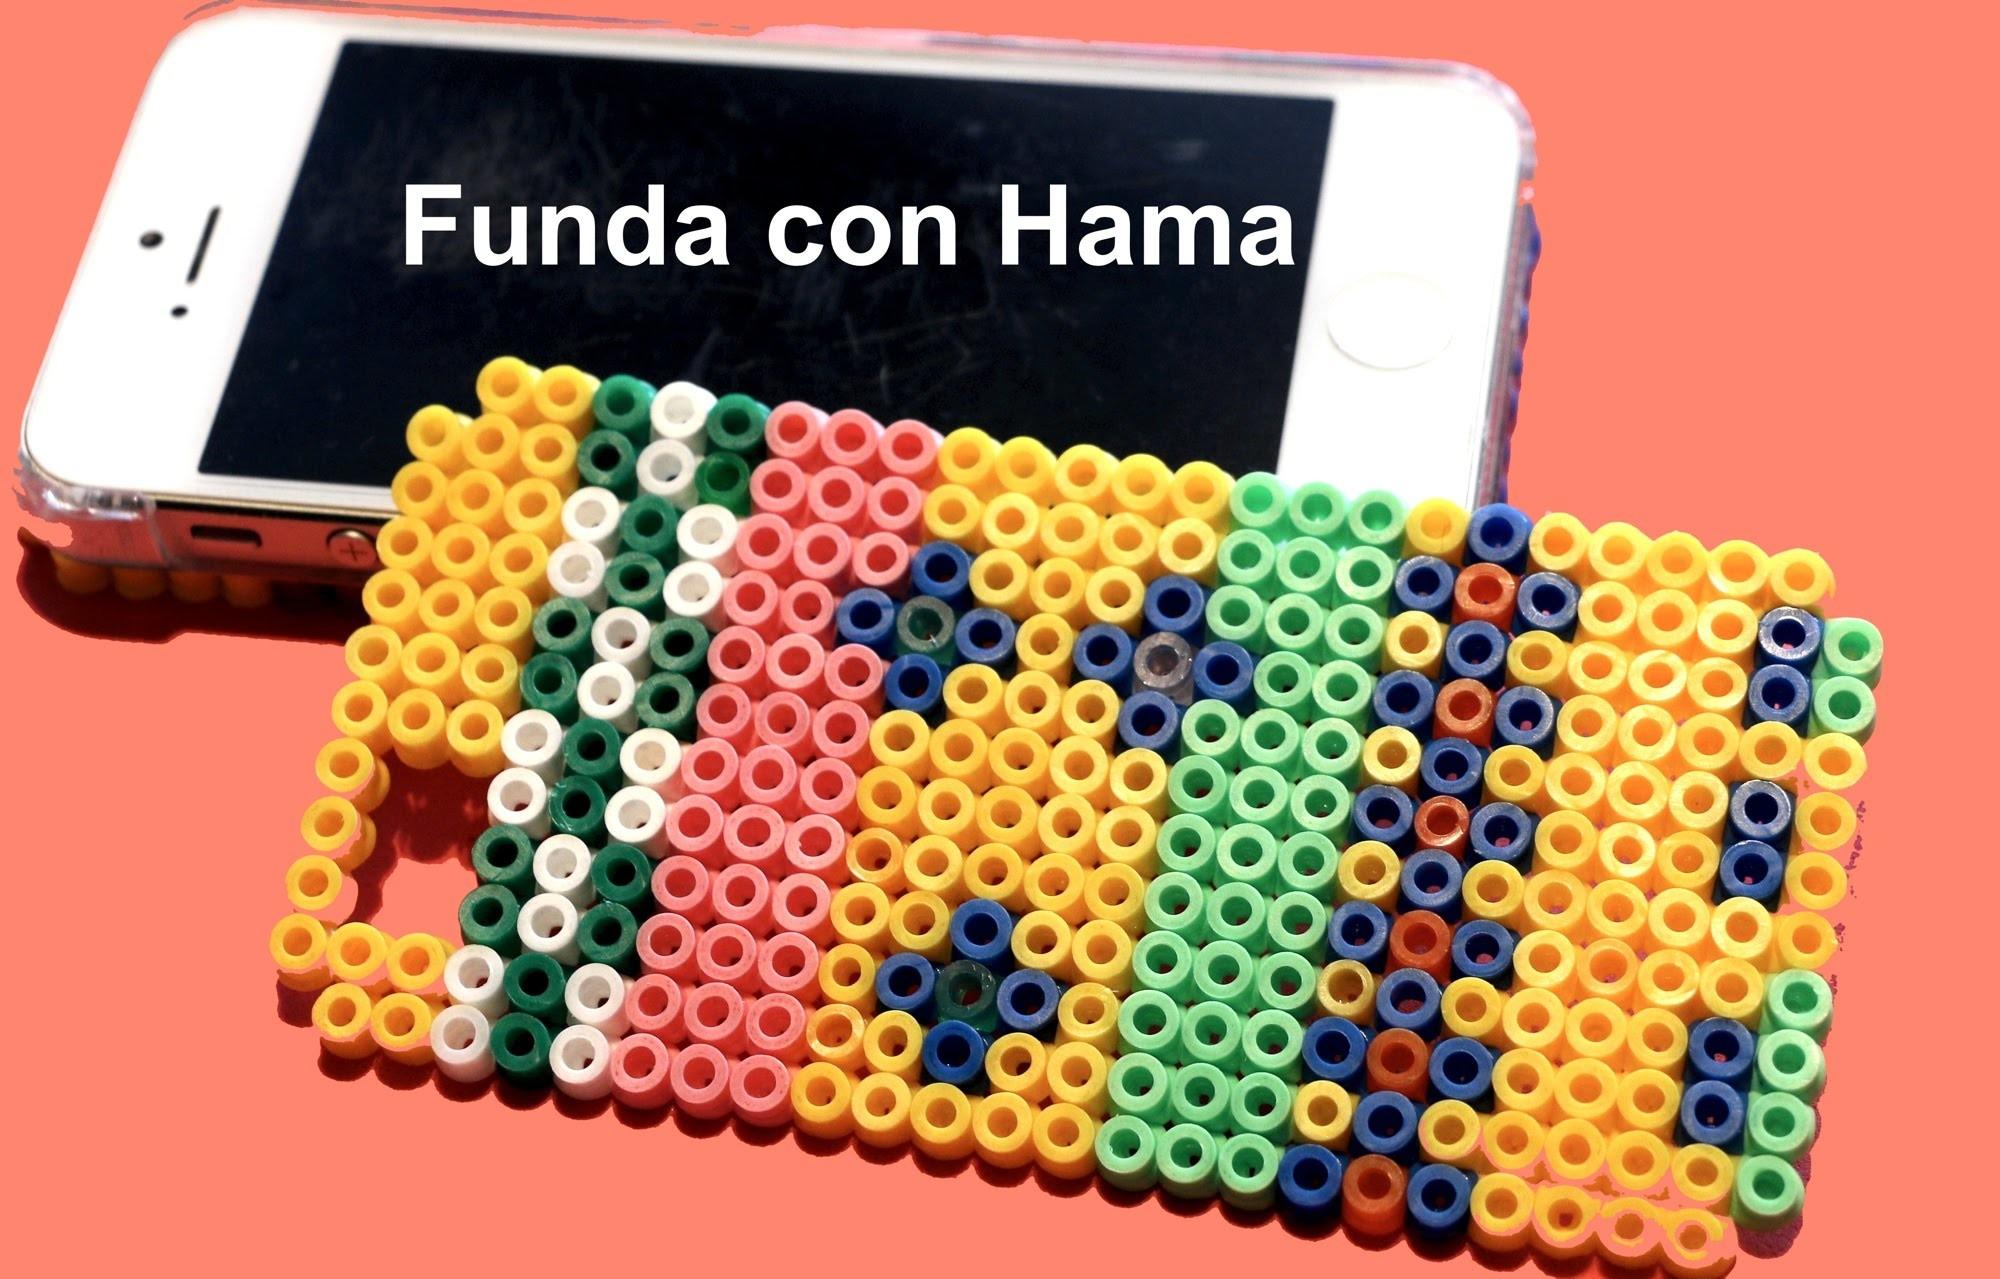 Funda de móvil con Hama. Hama perler beads ideas